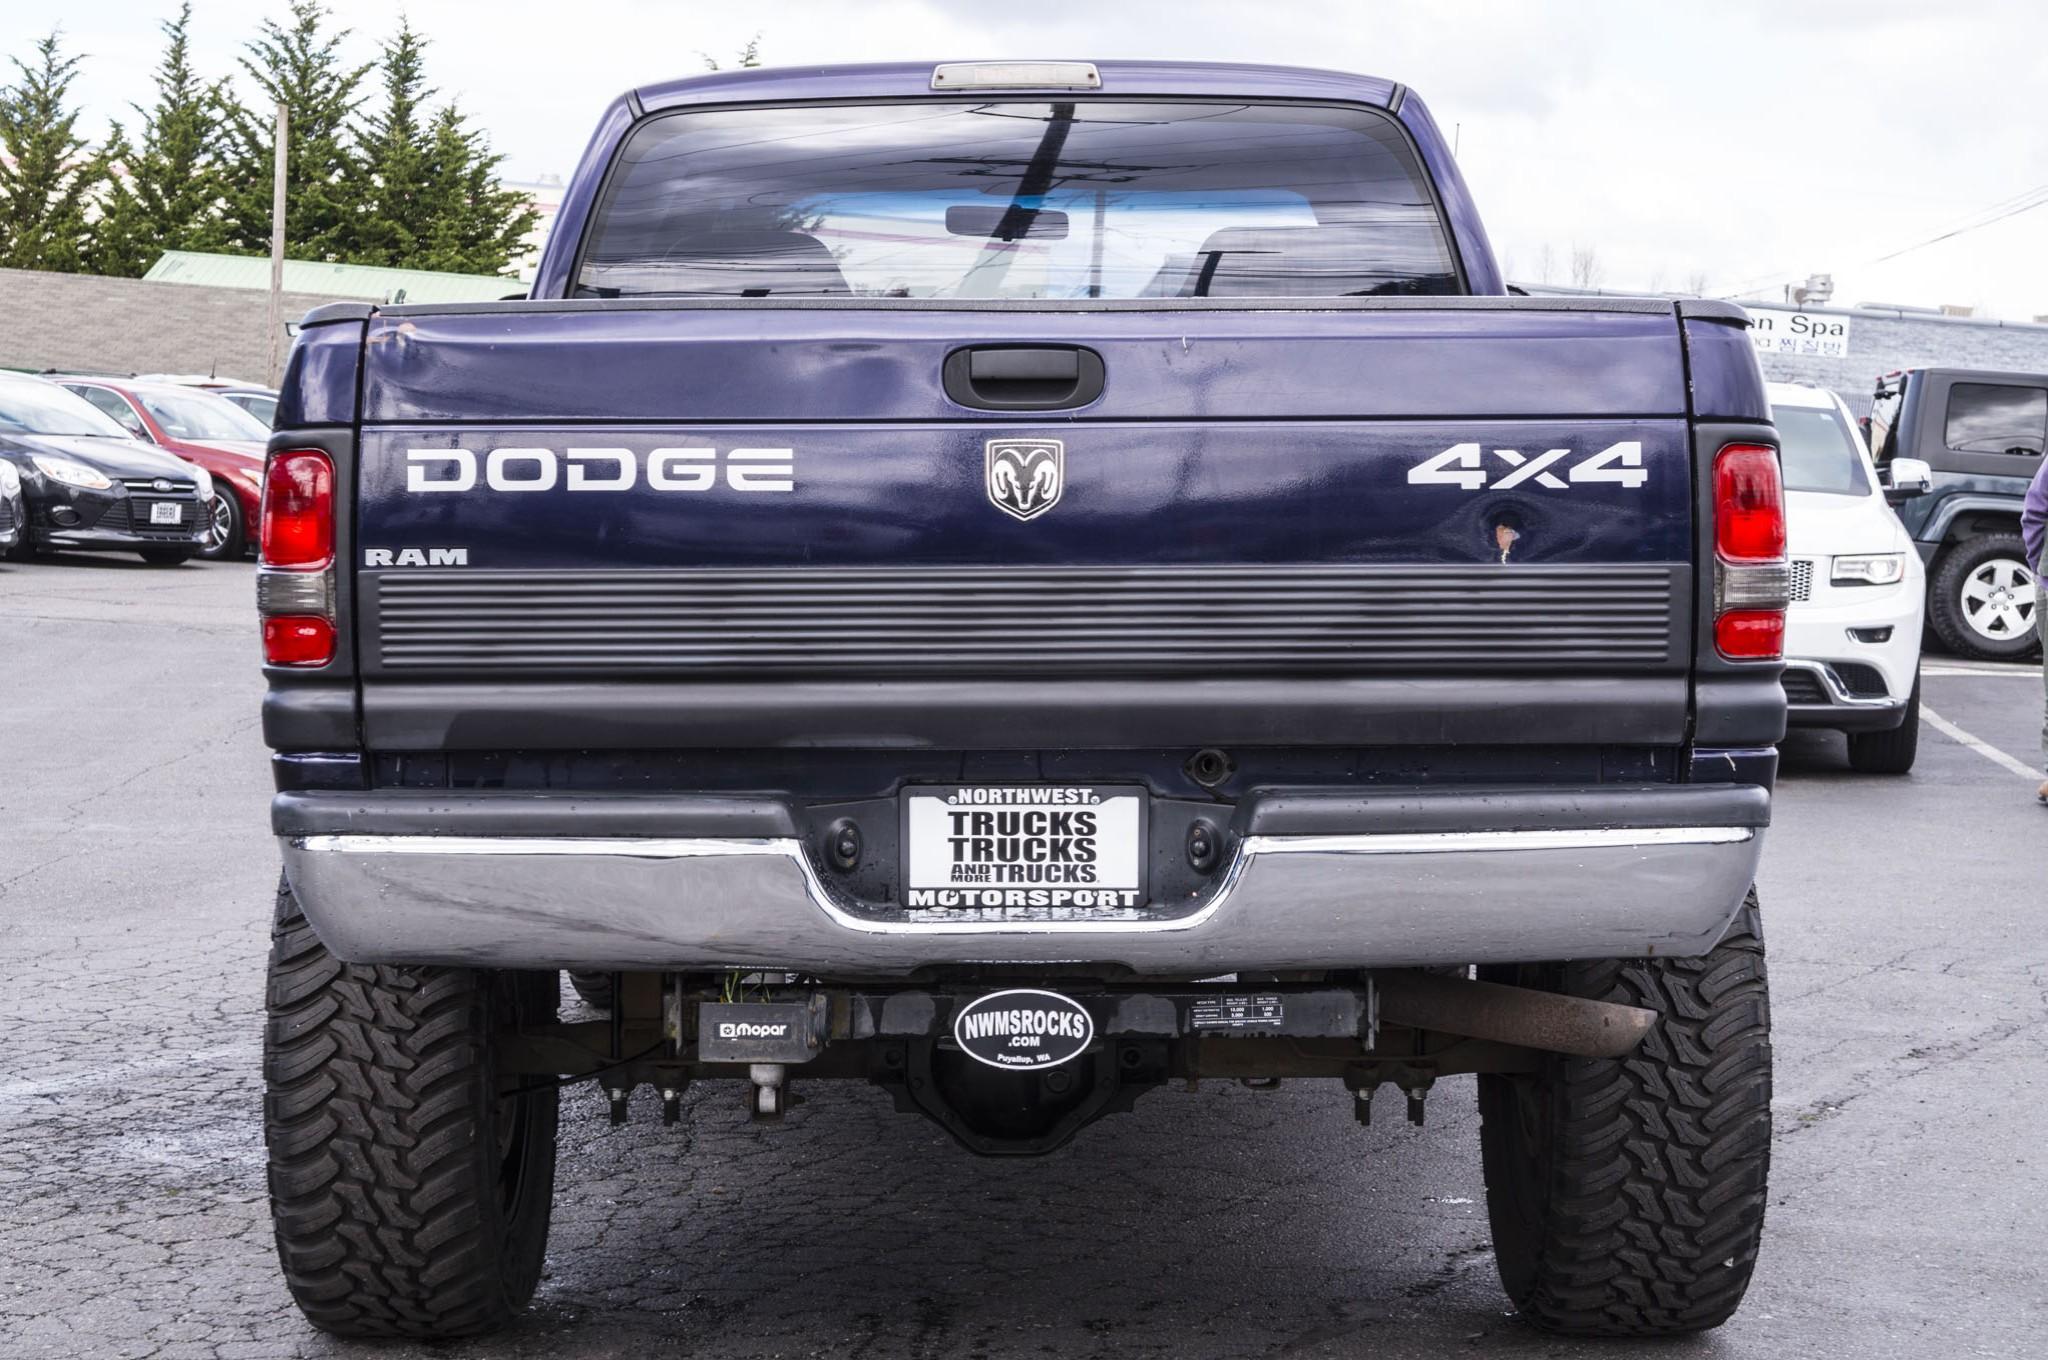 used lifted 1998 dodge ram 1500 slt 4x4 truck for sale 39310a. Black Bedroom Furniture Sets. Home Design Ideas